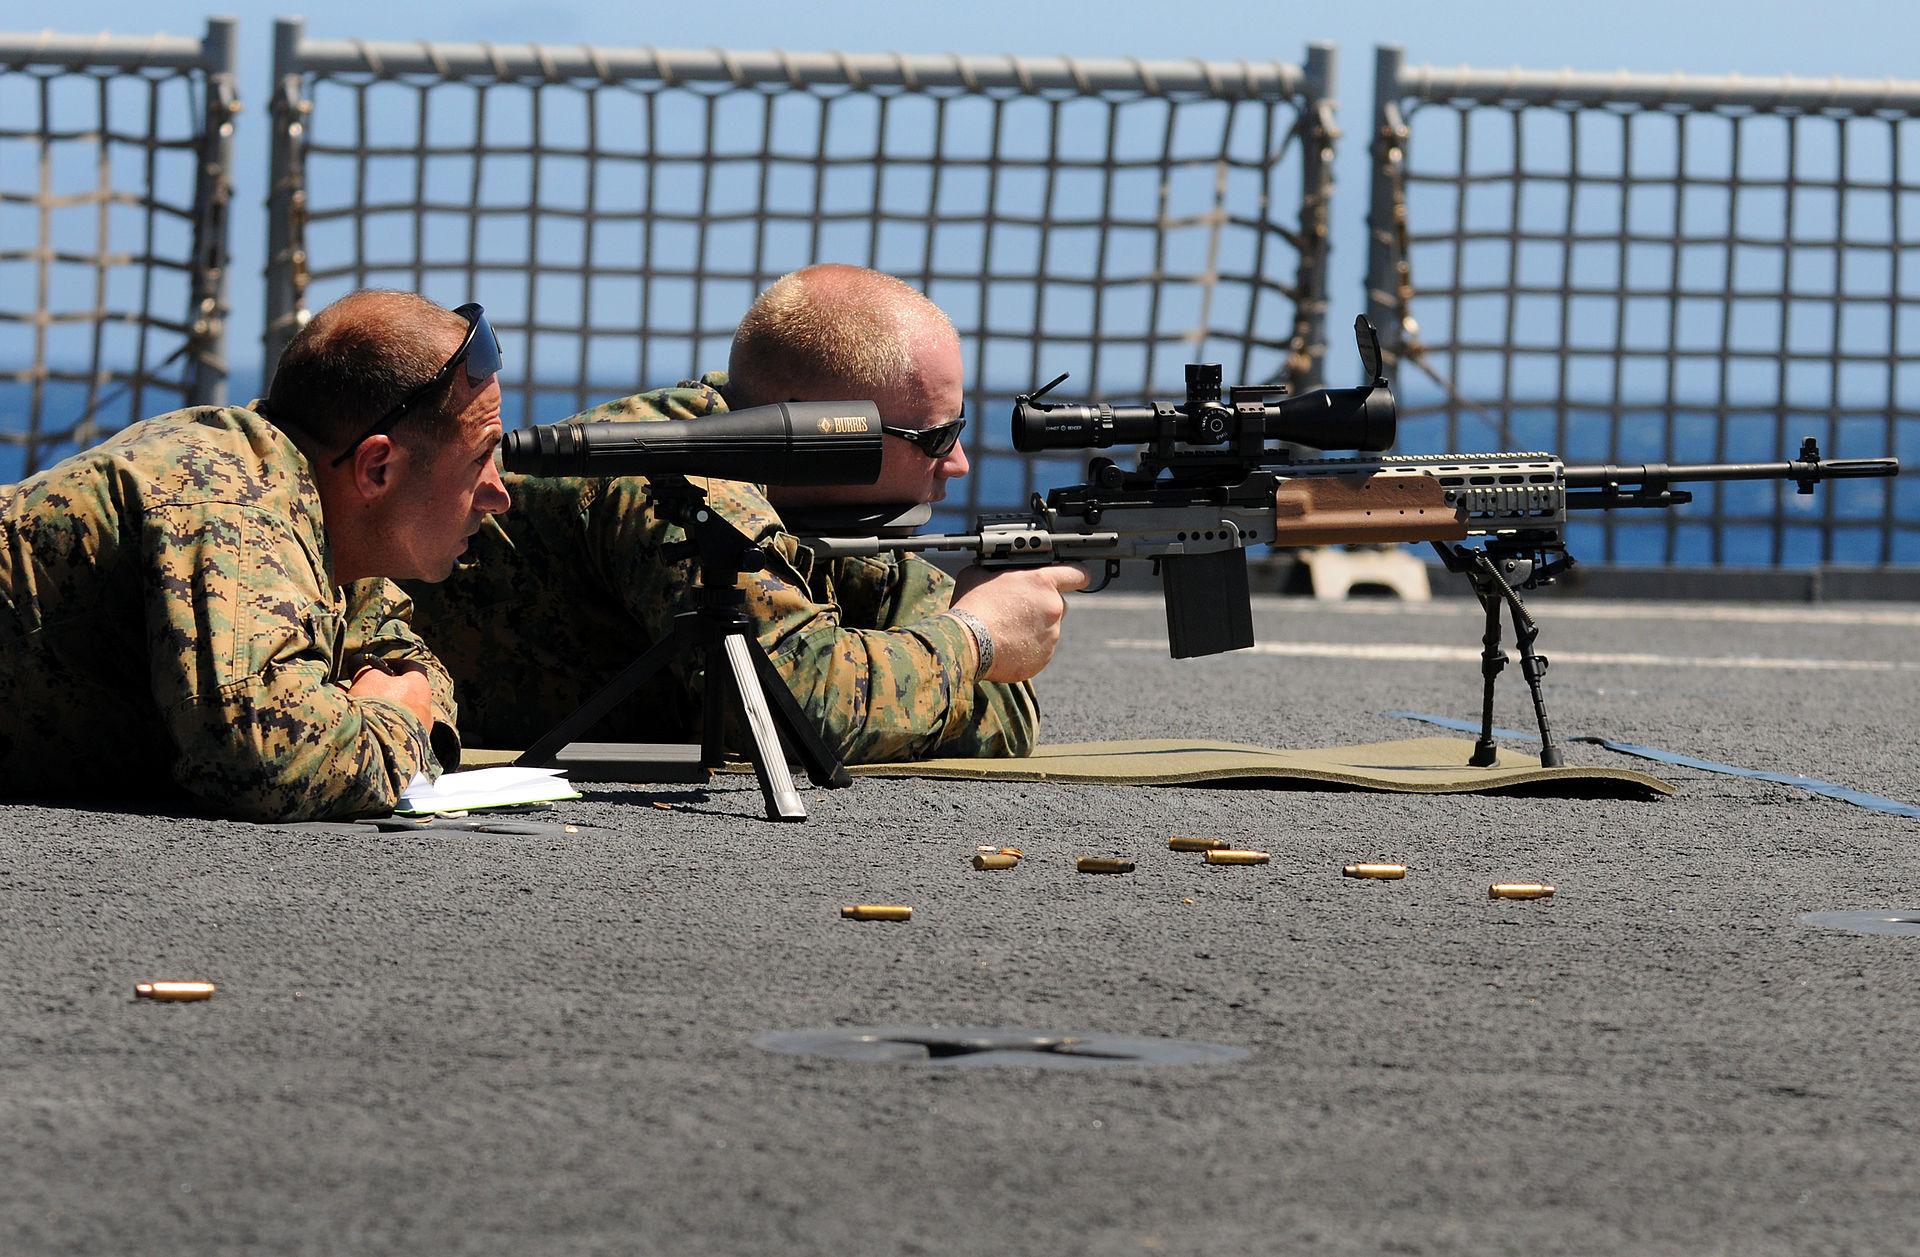 Long Range Shooting Course